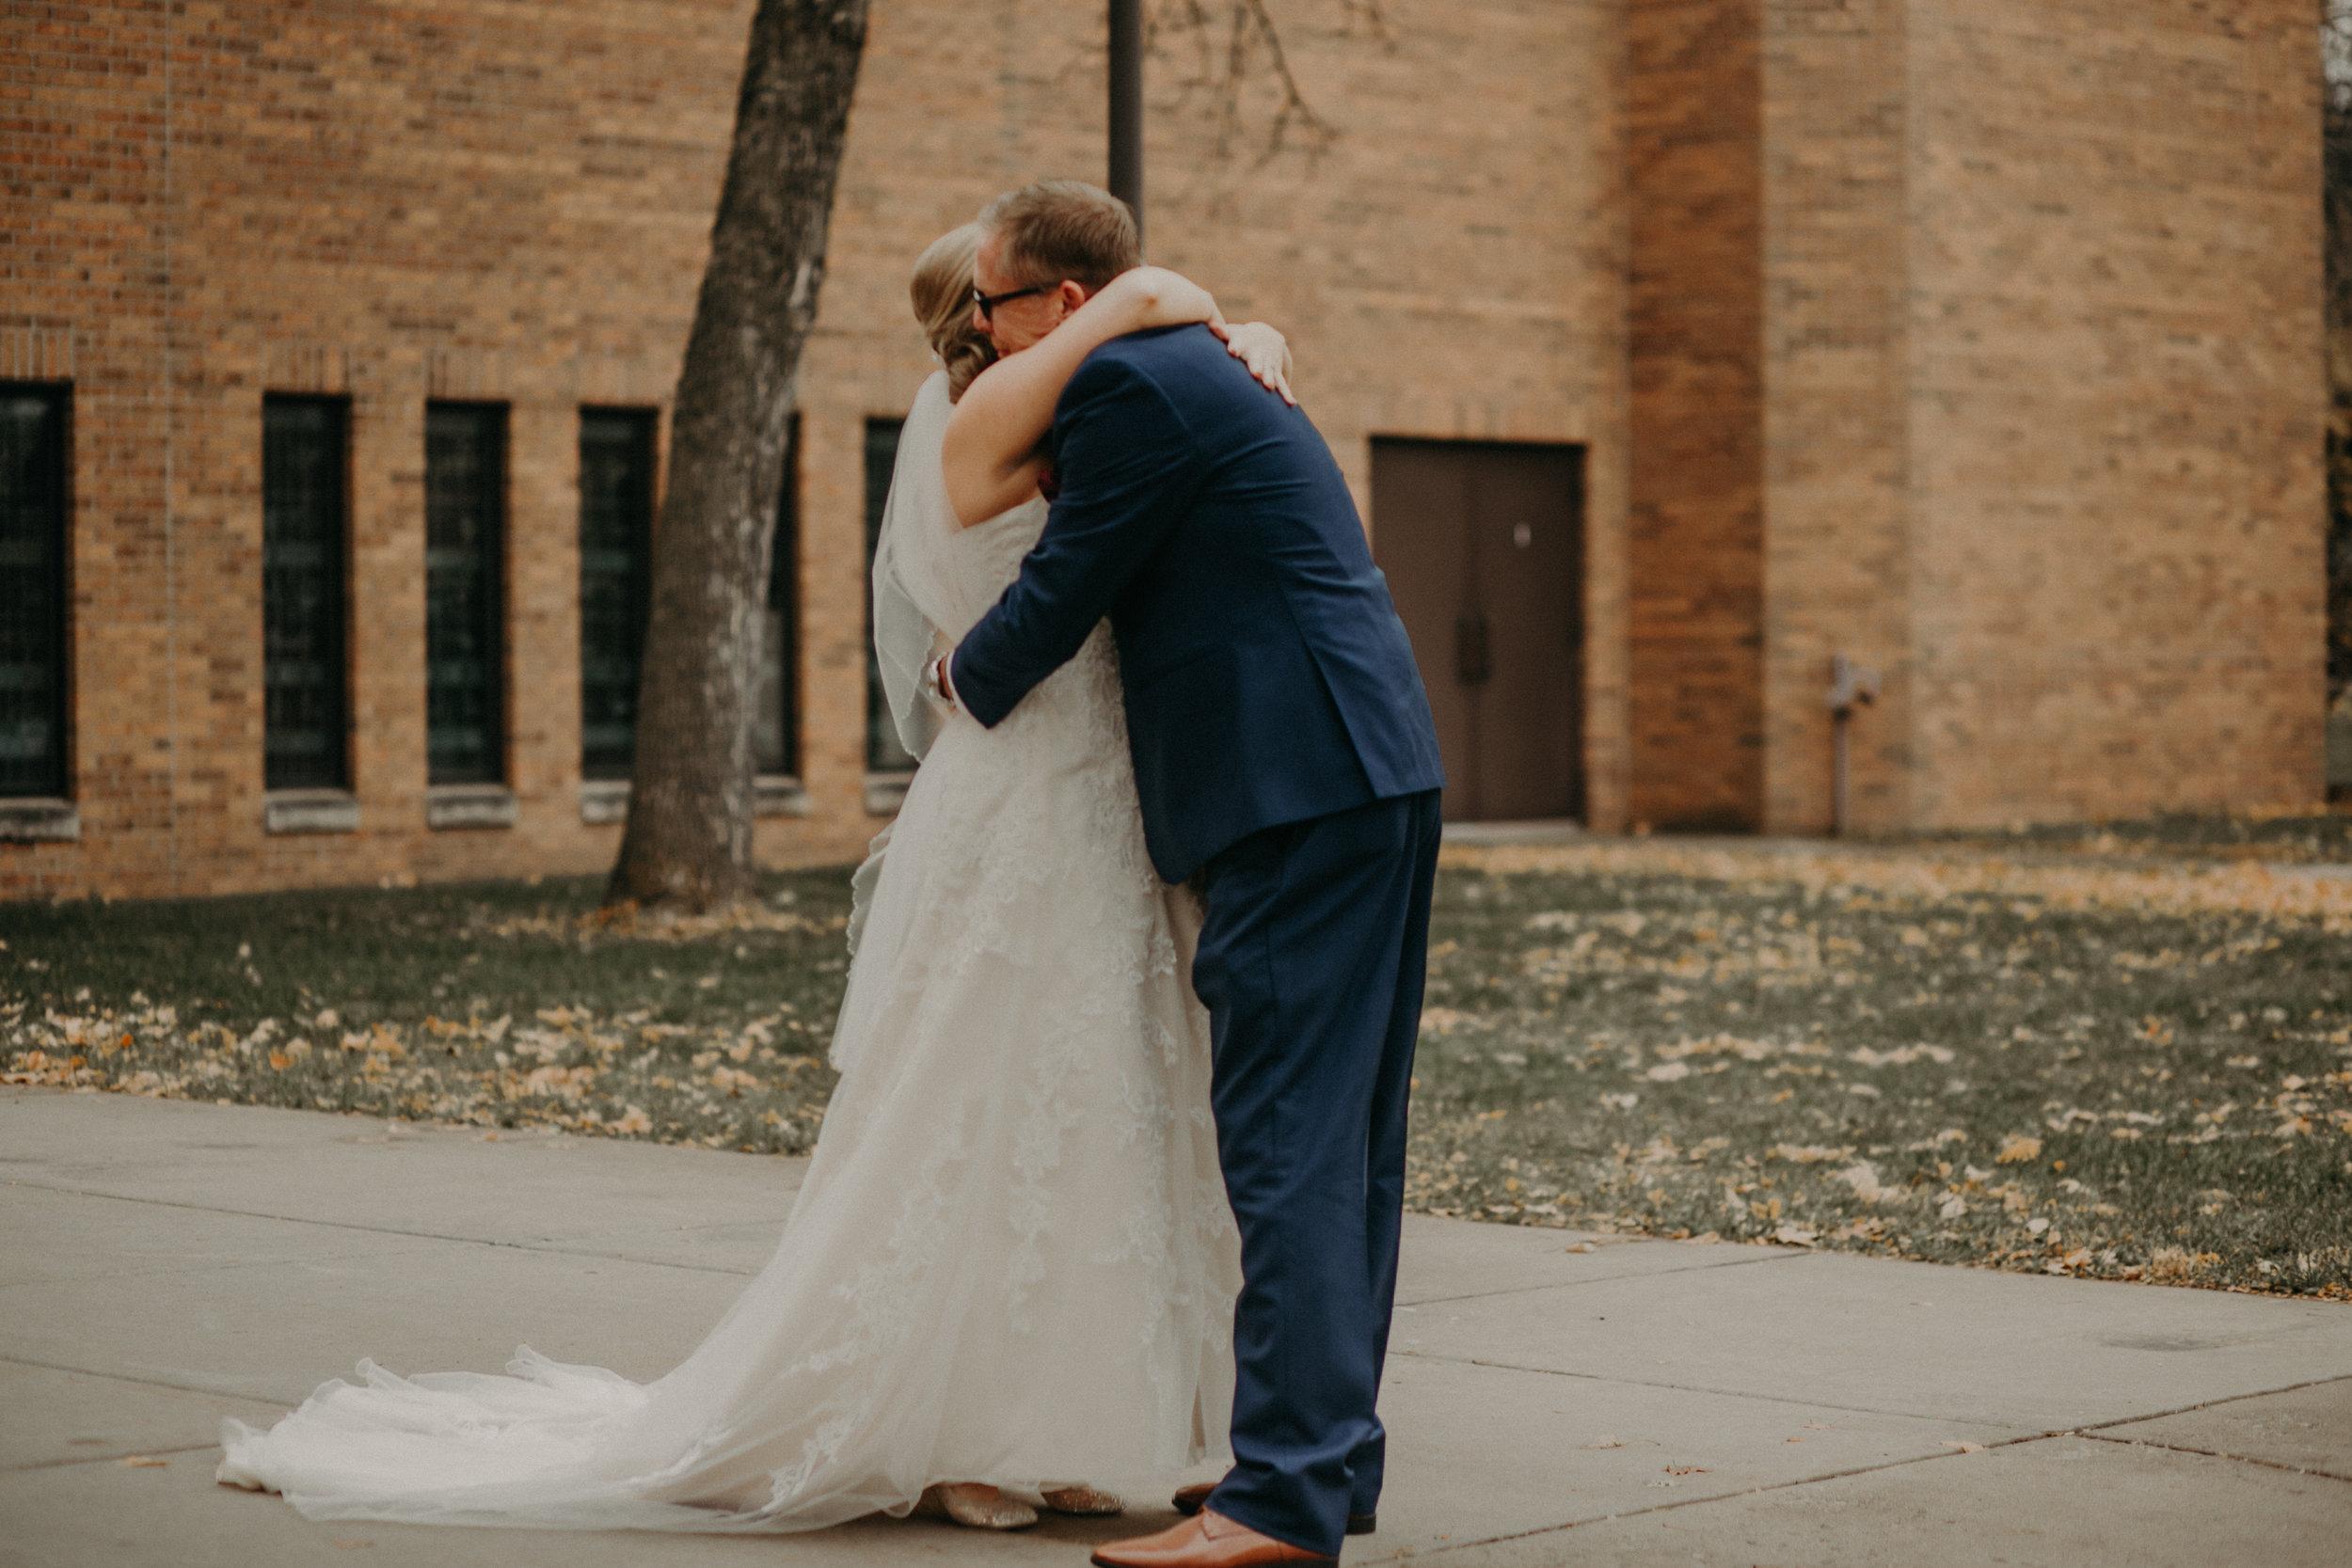 Weisenbeck_Wedding_Oct2018-101.jpg